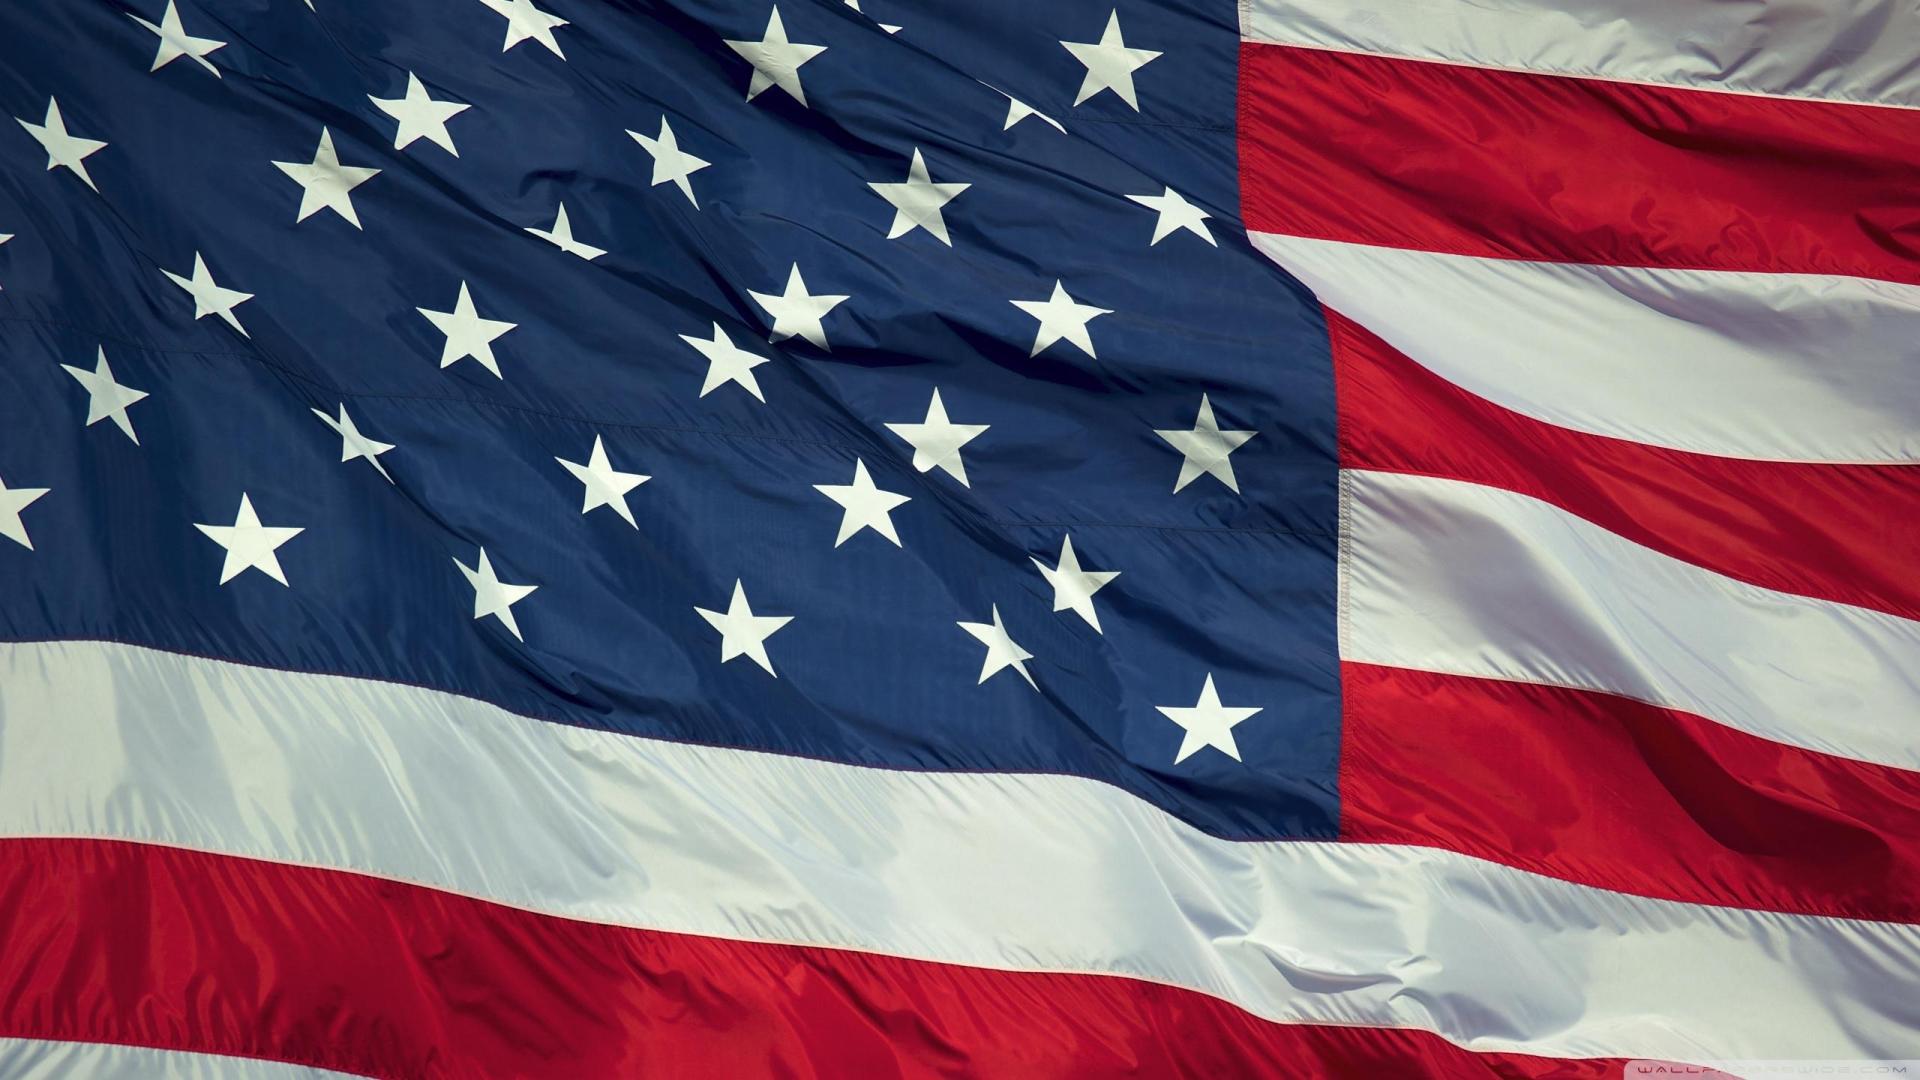 AmericanUSA Flag HD Desktop Wallpaper Background download 1920x1080